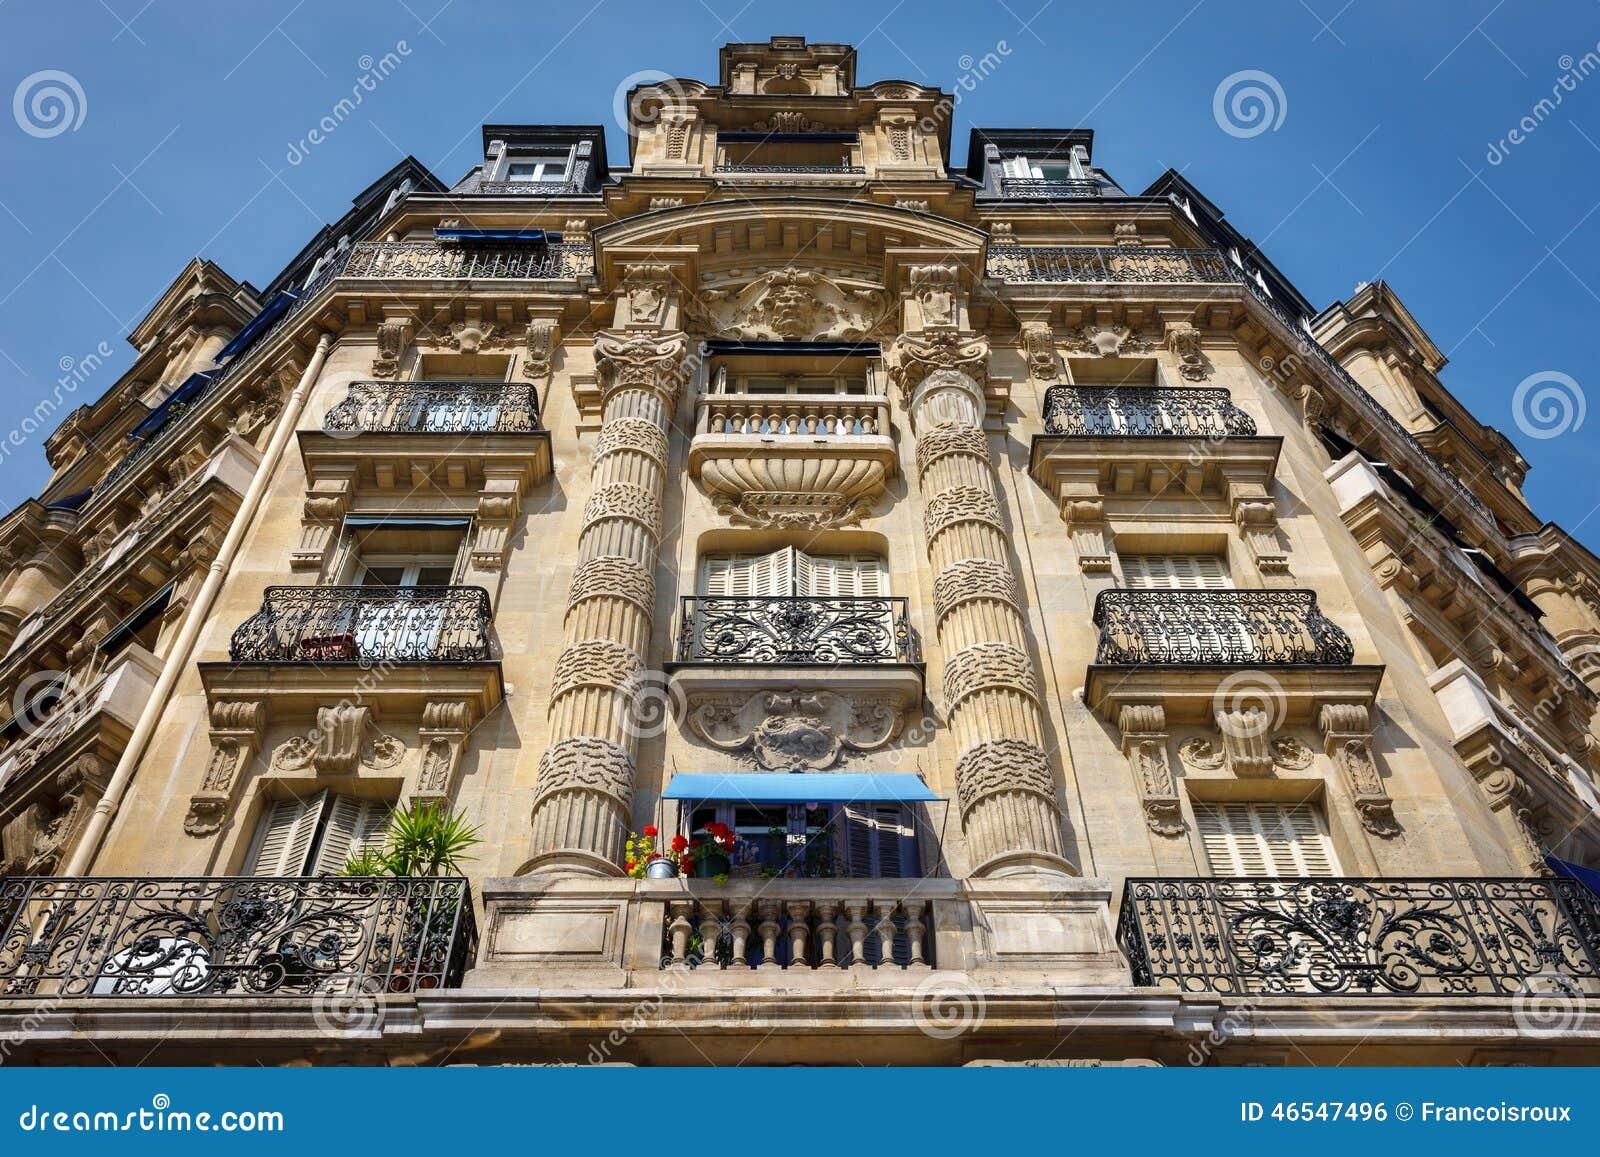 paris architecture haussmannian facade and ornaments stock photo image 46547496. Black Bedroom Furniture Sets. Home Design Ideas